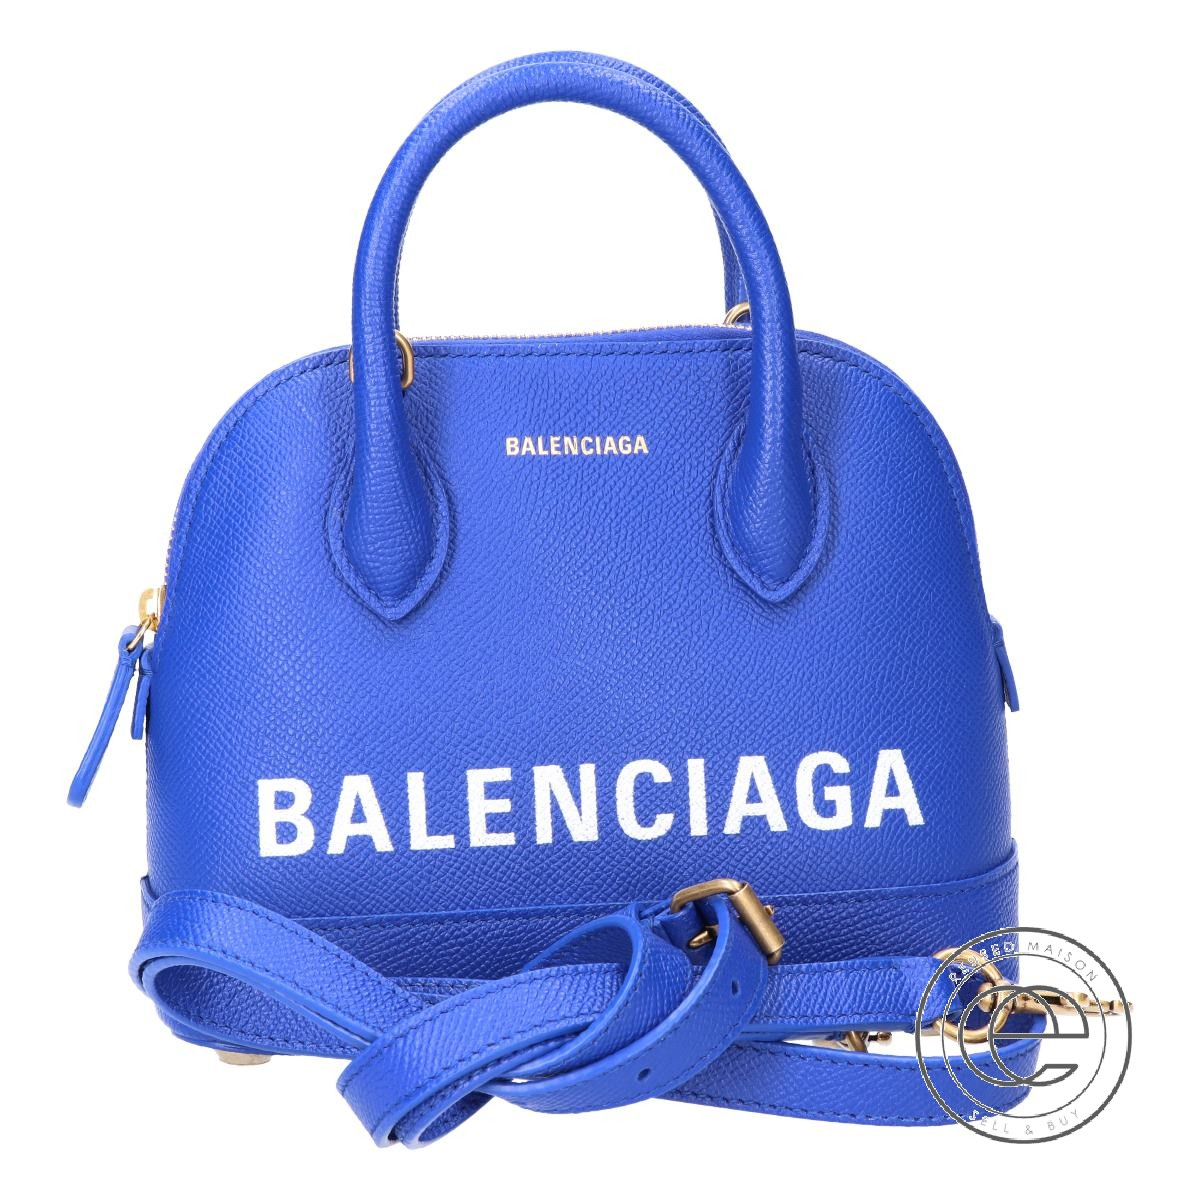 BALENCIAGA バレンシアガ VILLE TOP HANDLE XXS ロゴ 2WAYショルダー ハンドバッグ ブルー系 レディース 【中古】